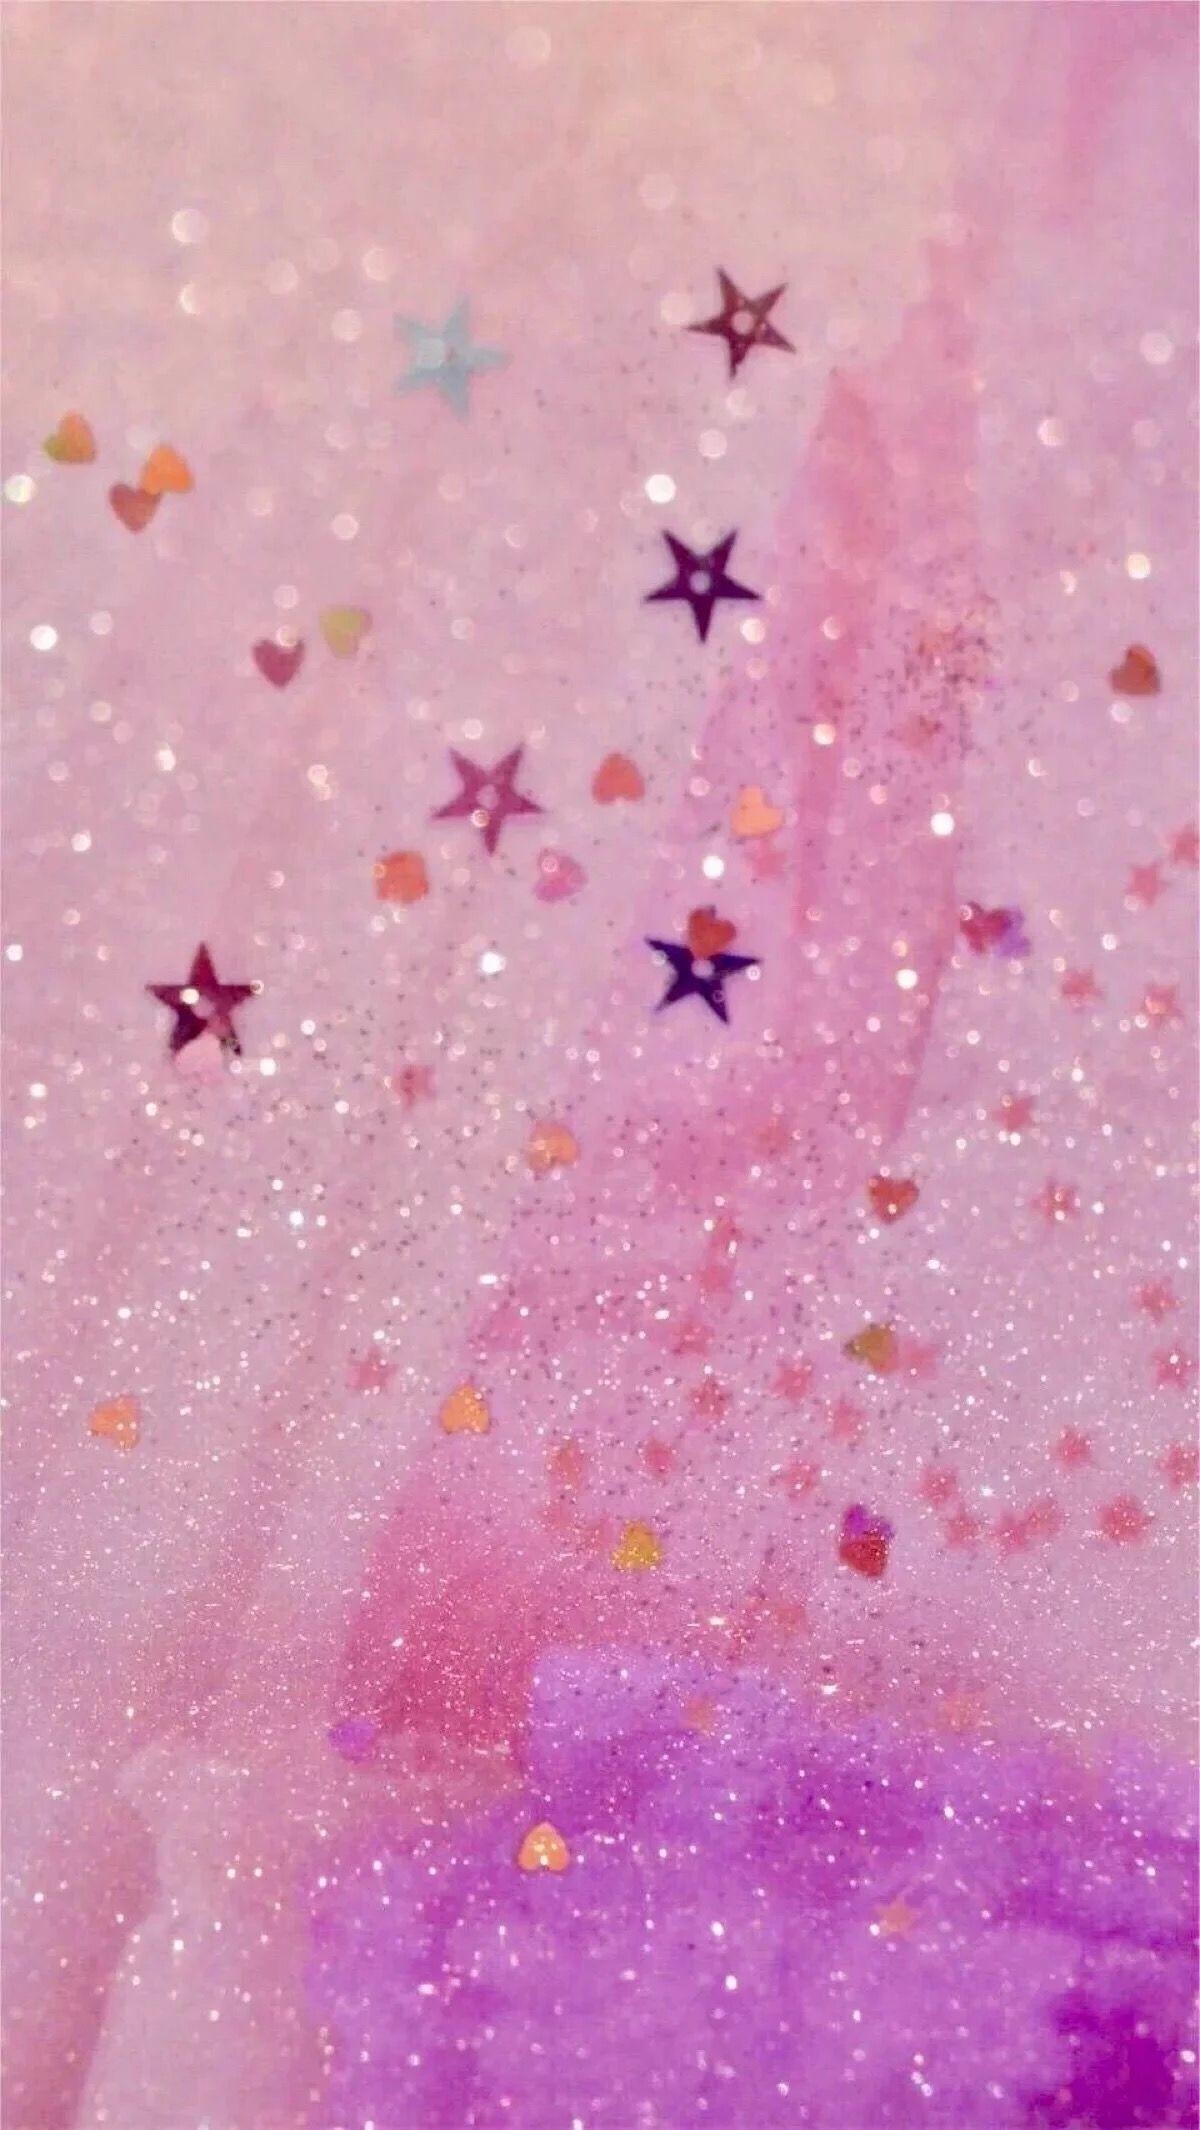 Baymax Pink Cute Wallpaper 1 082 Ã 1 920 Pixels - Girly Wallpaper For Mobile , HD Wallpaper & Backgrounds